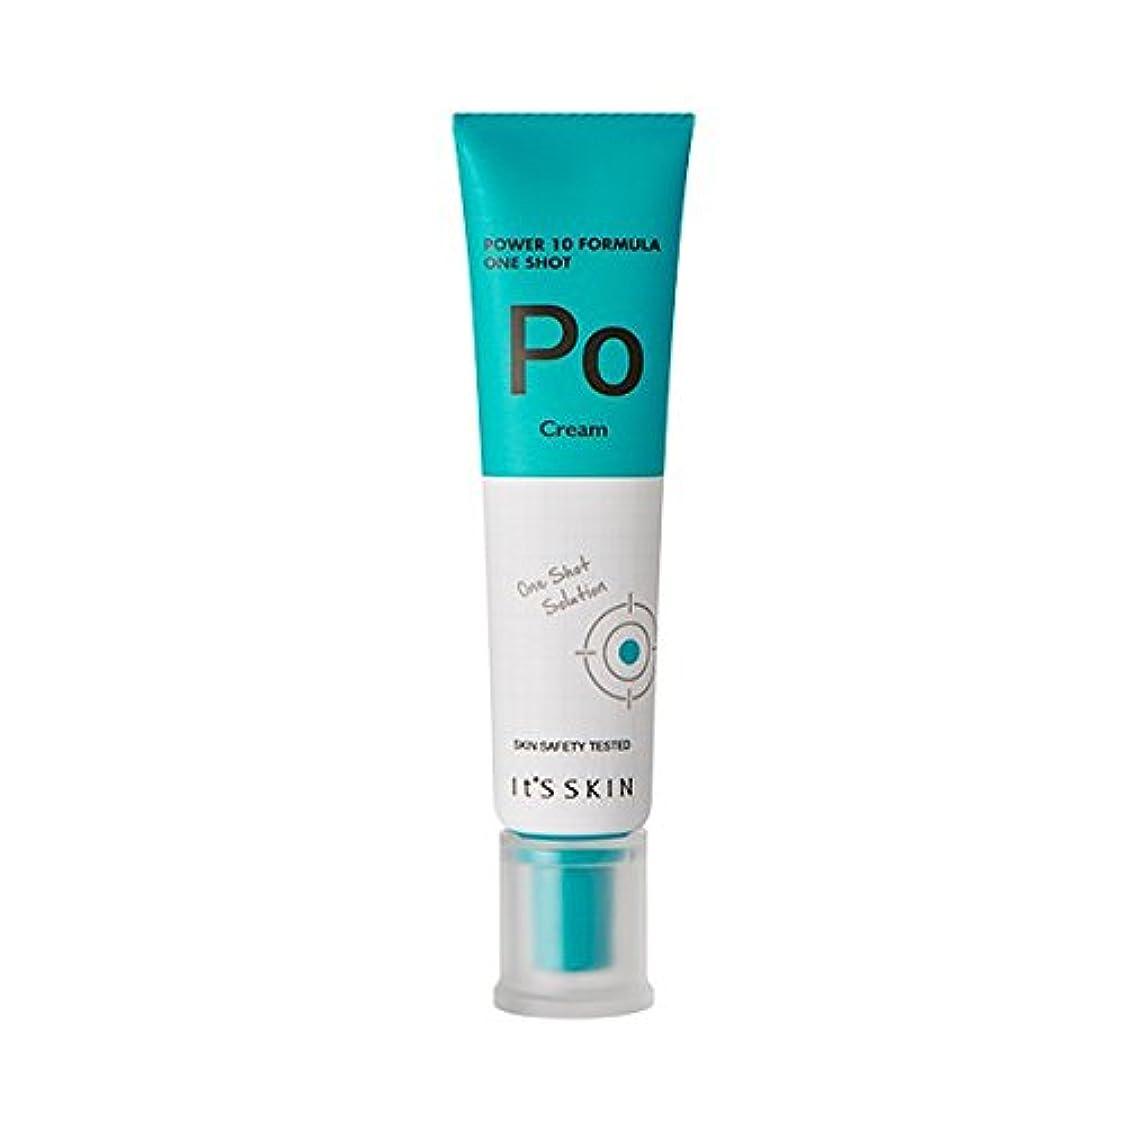 [New] It's Skin Power 10 Formula One Shot Cream (Po) / イッツスキンパワー10 フォーミュラワンショットクリーム [並行輸入品]